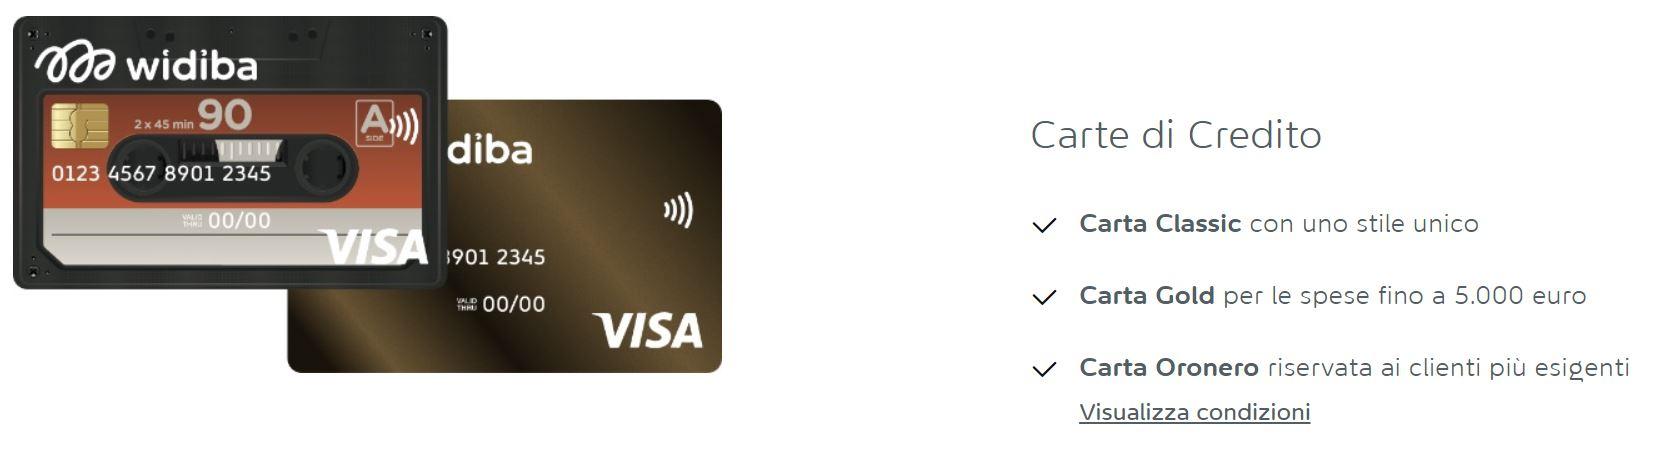 carte di credito widiba